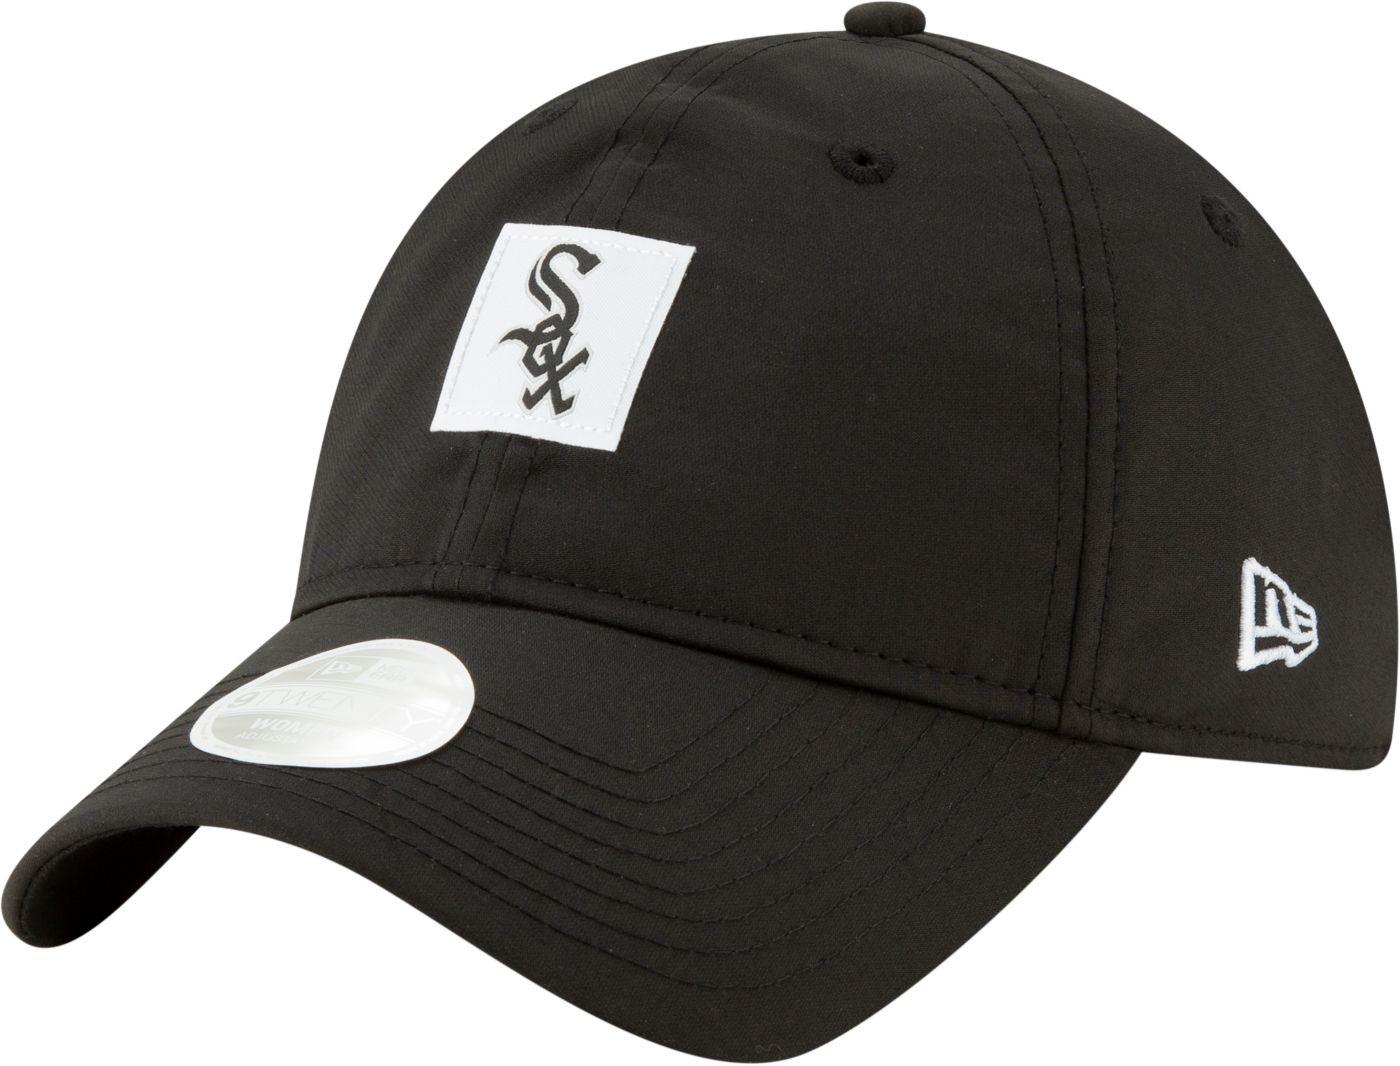 New Era Women's Chicago White Sox 9Twenty Sleekest Fan Adjustable Hat